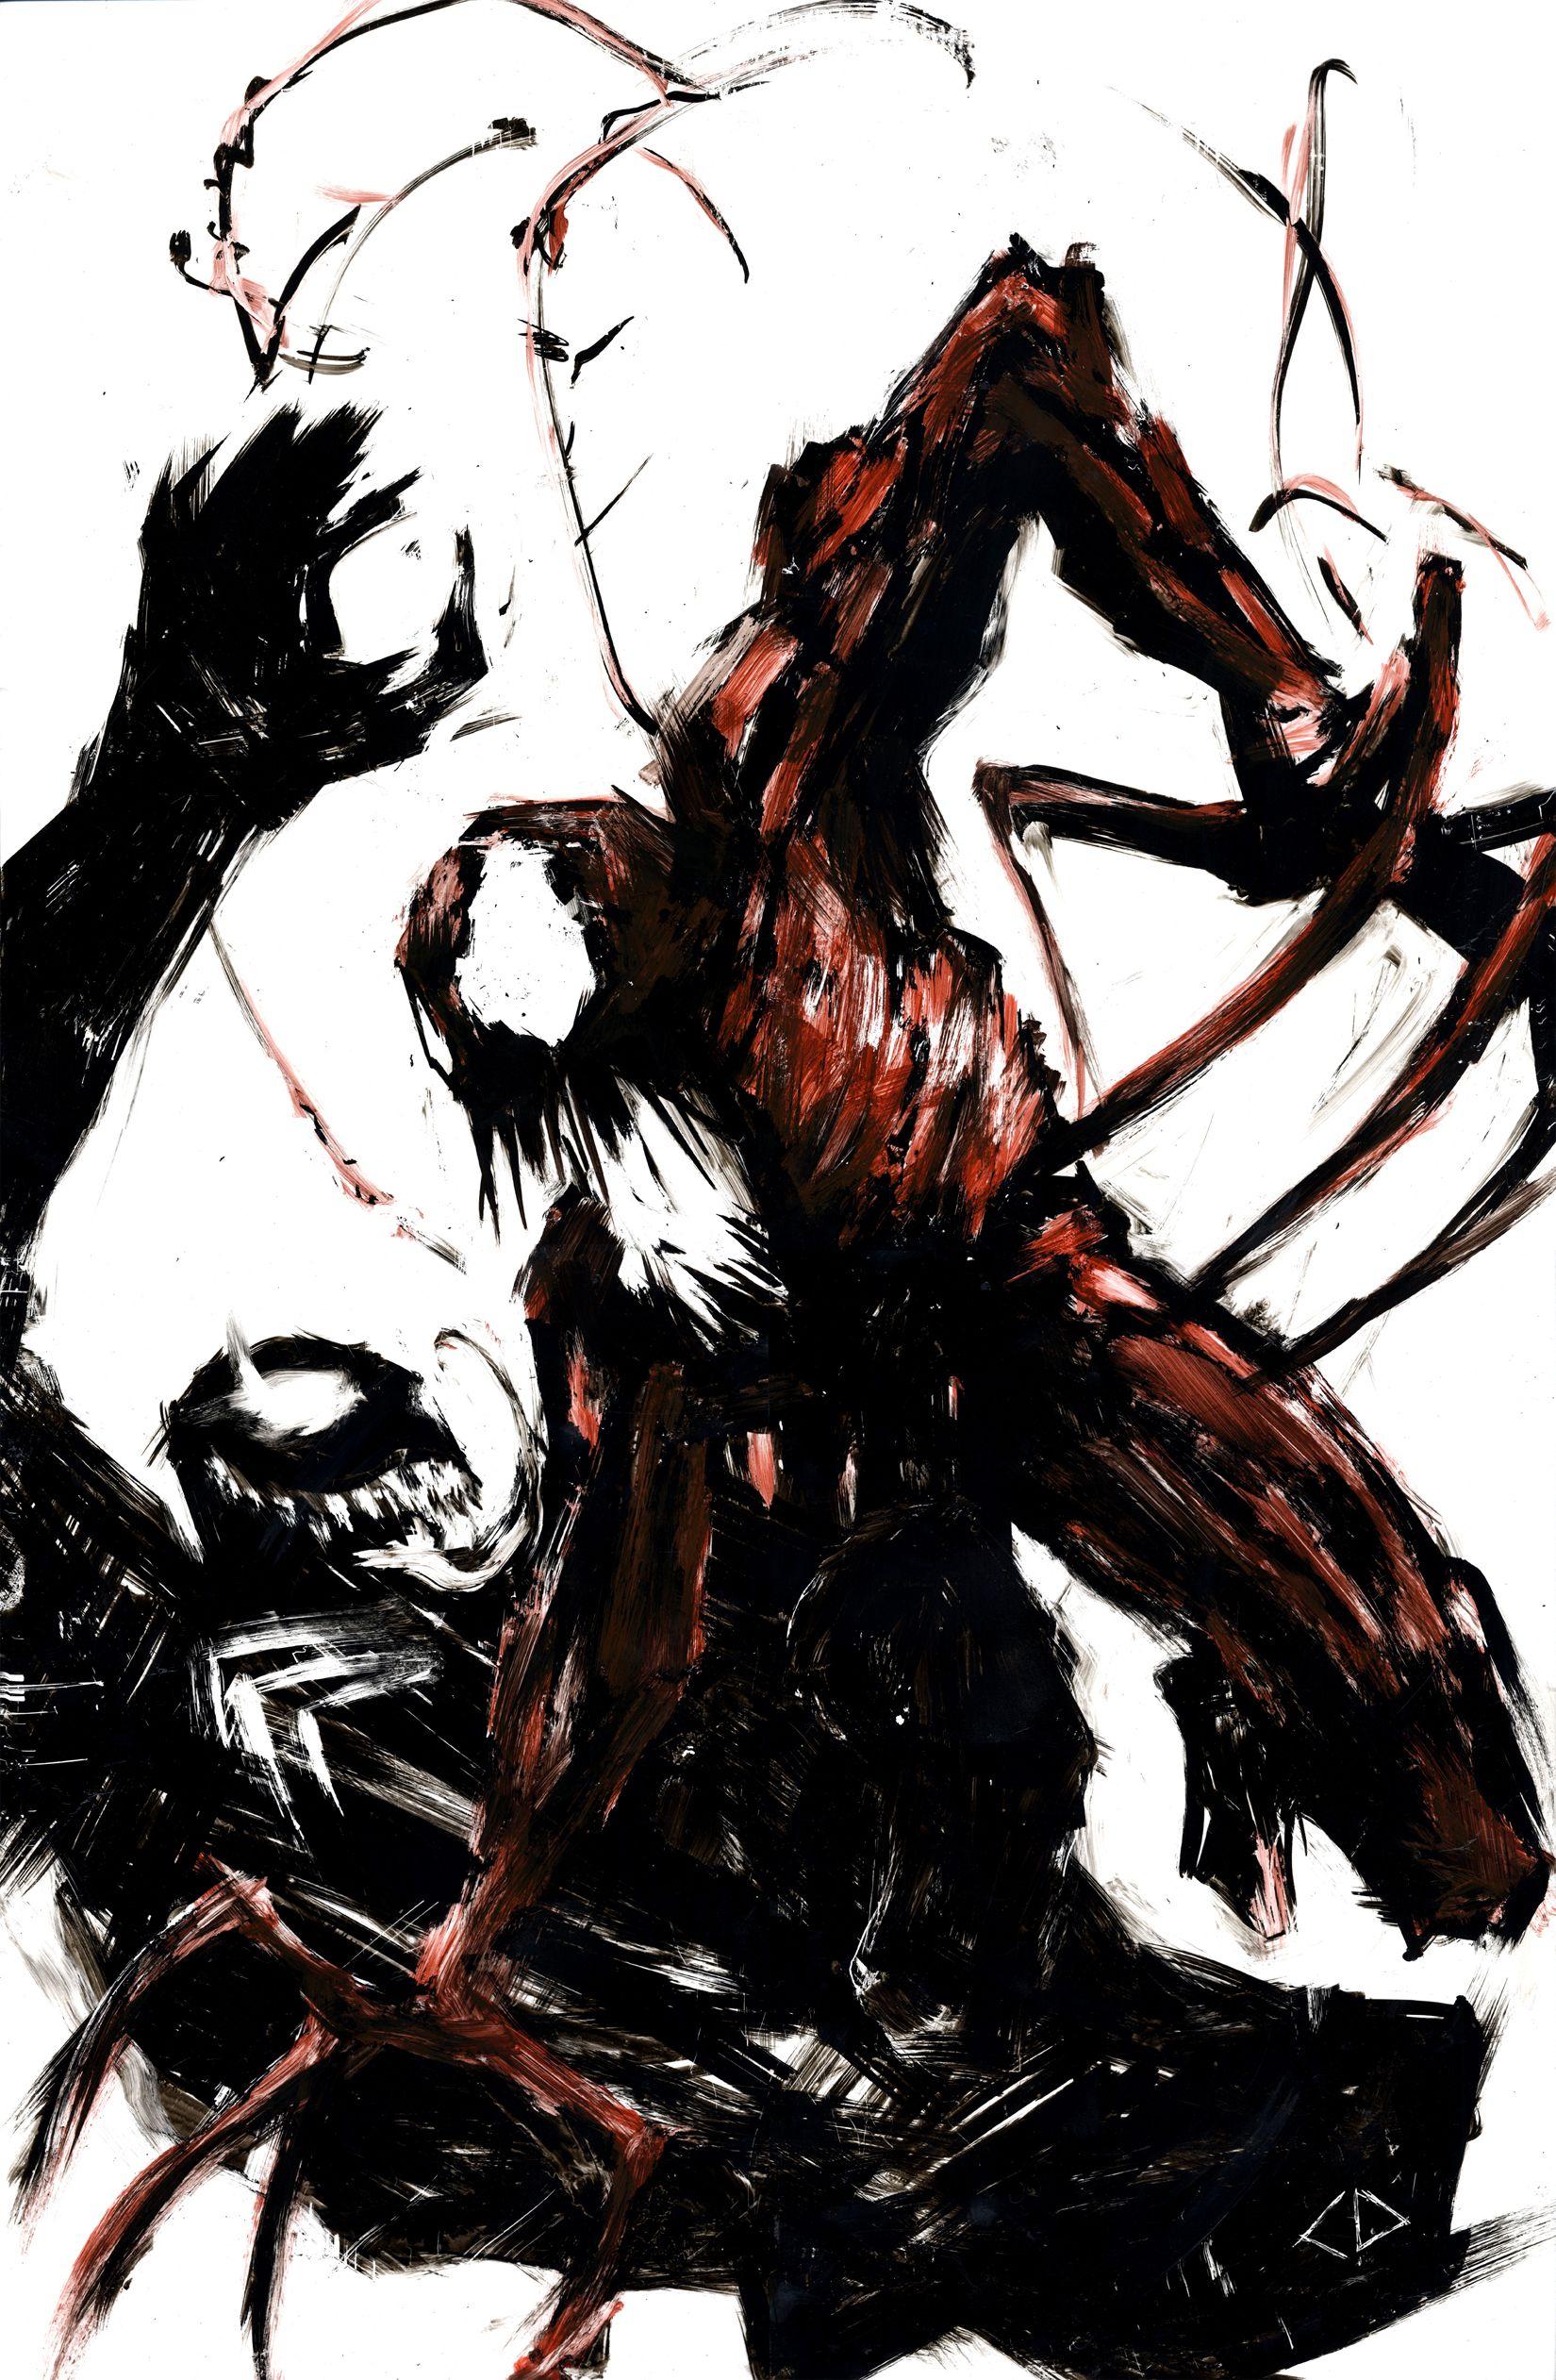 Carnage VS Venom | Super Heroes | Pinterest | Venom ...